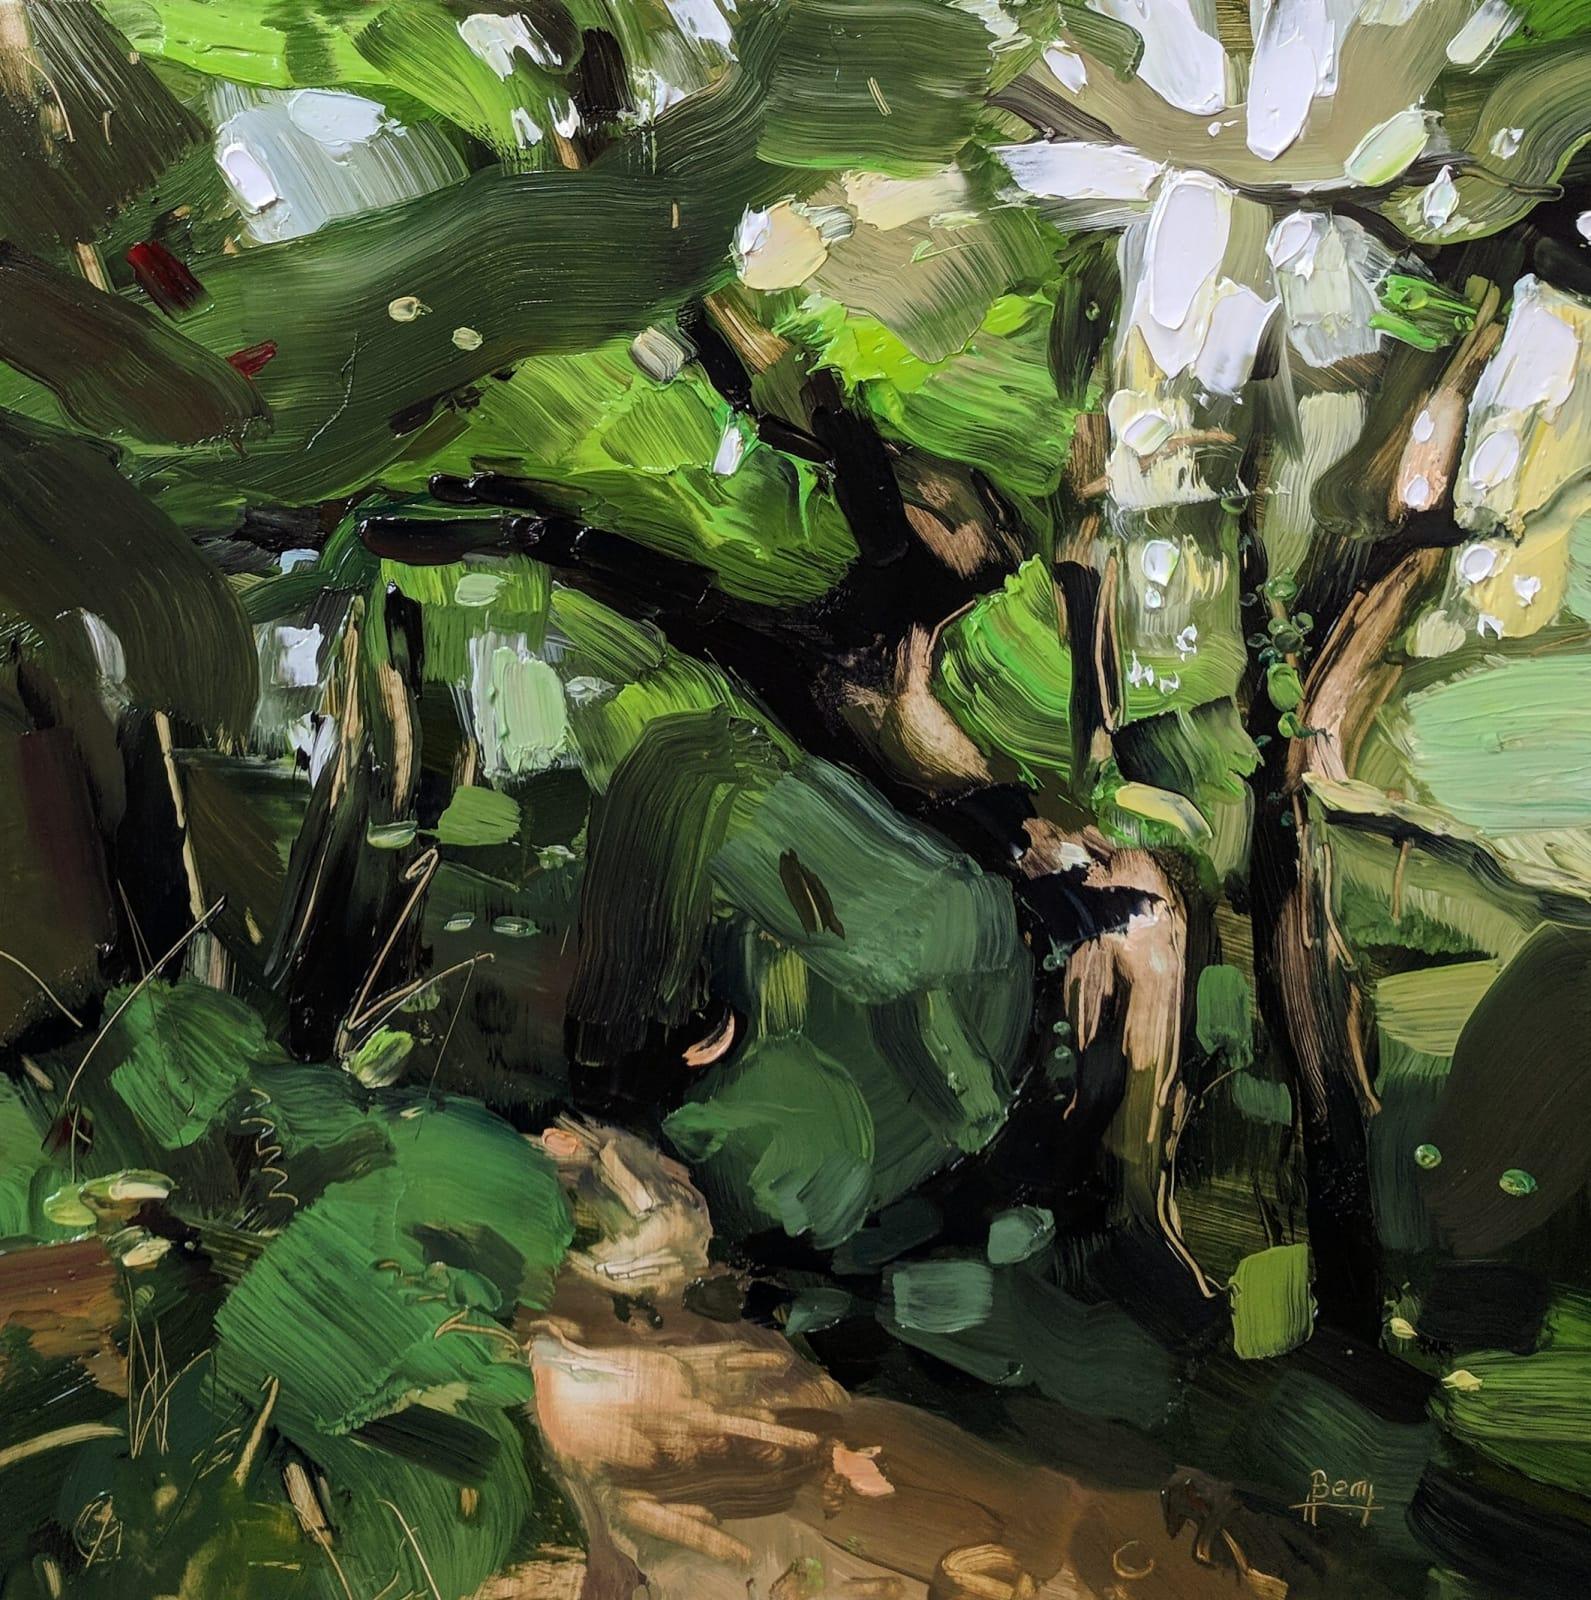 Hester Berry, A Green Bath. Beckland Wood, 2018